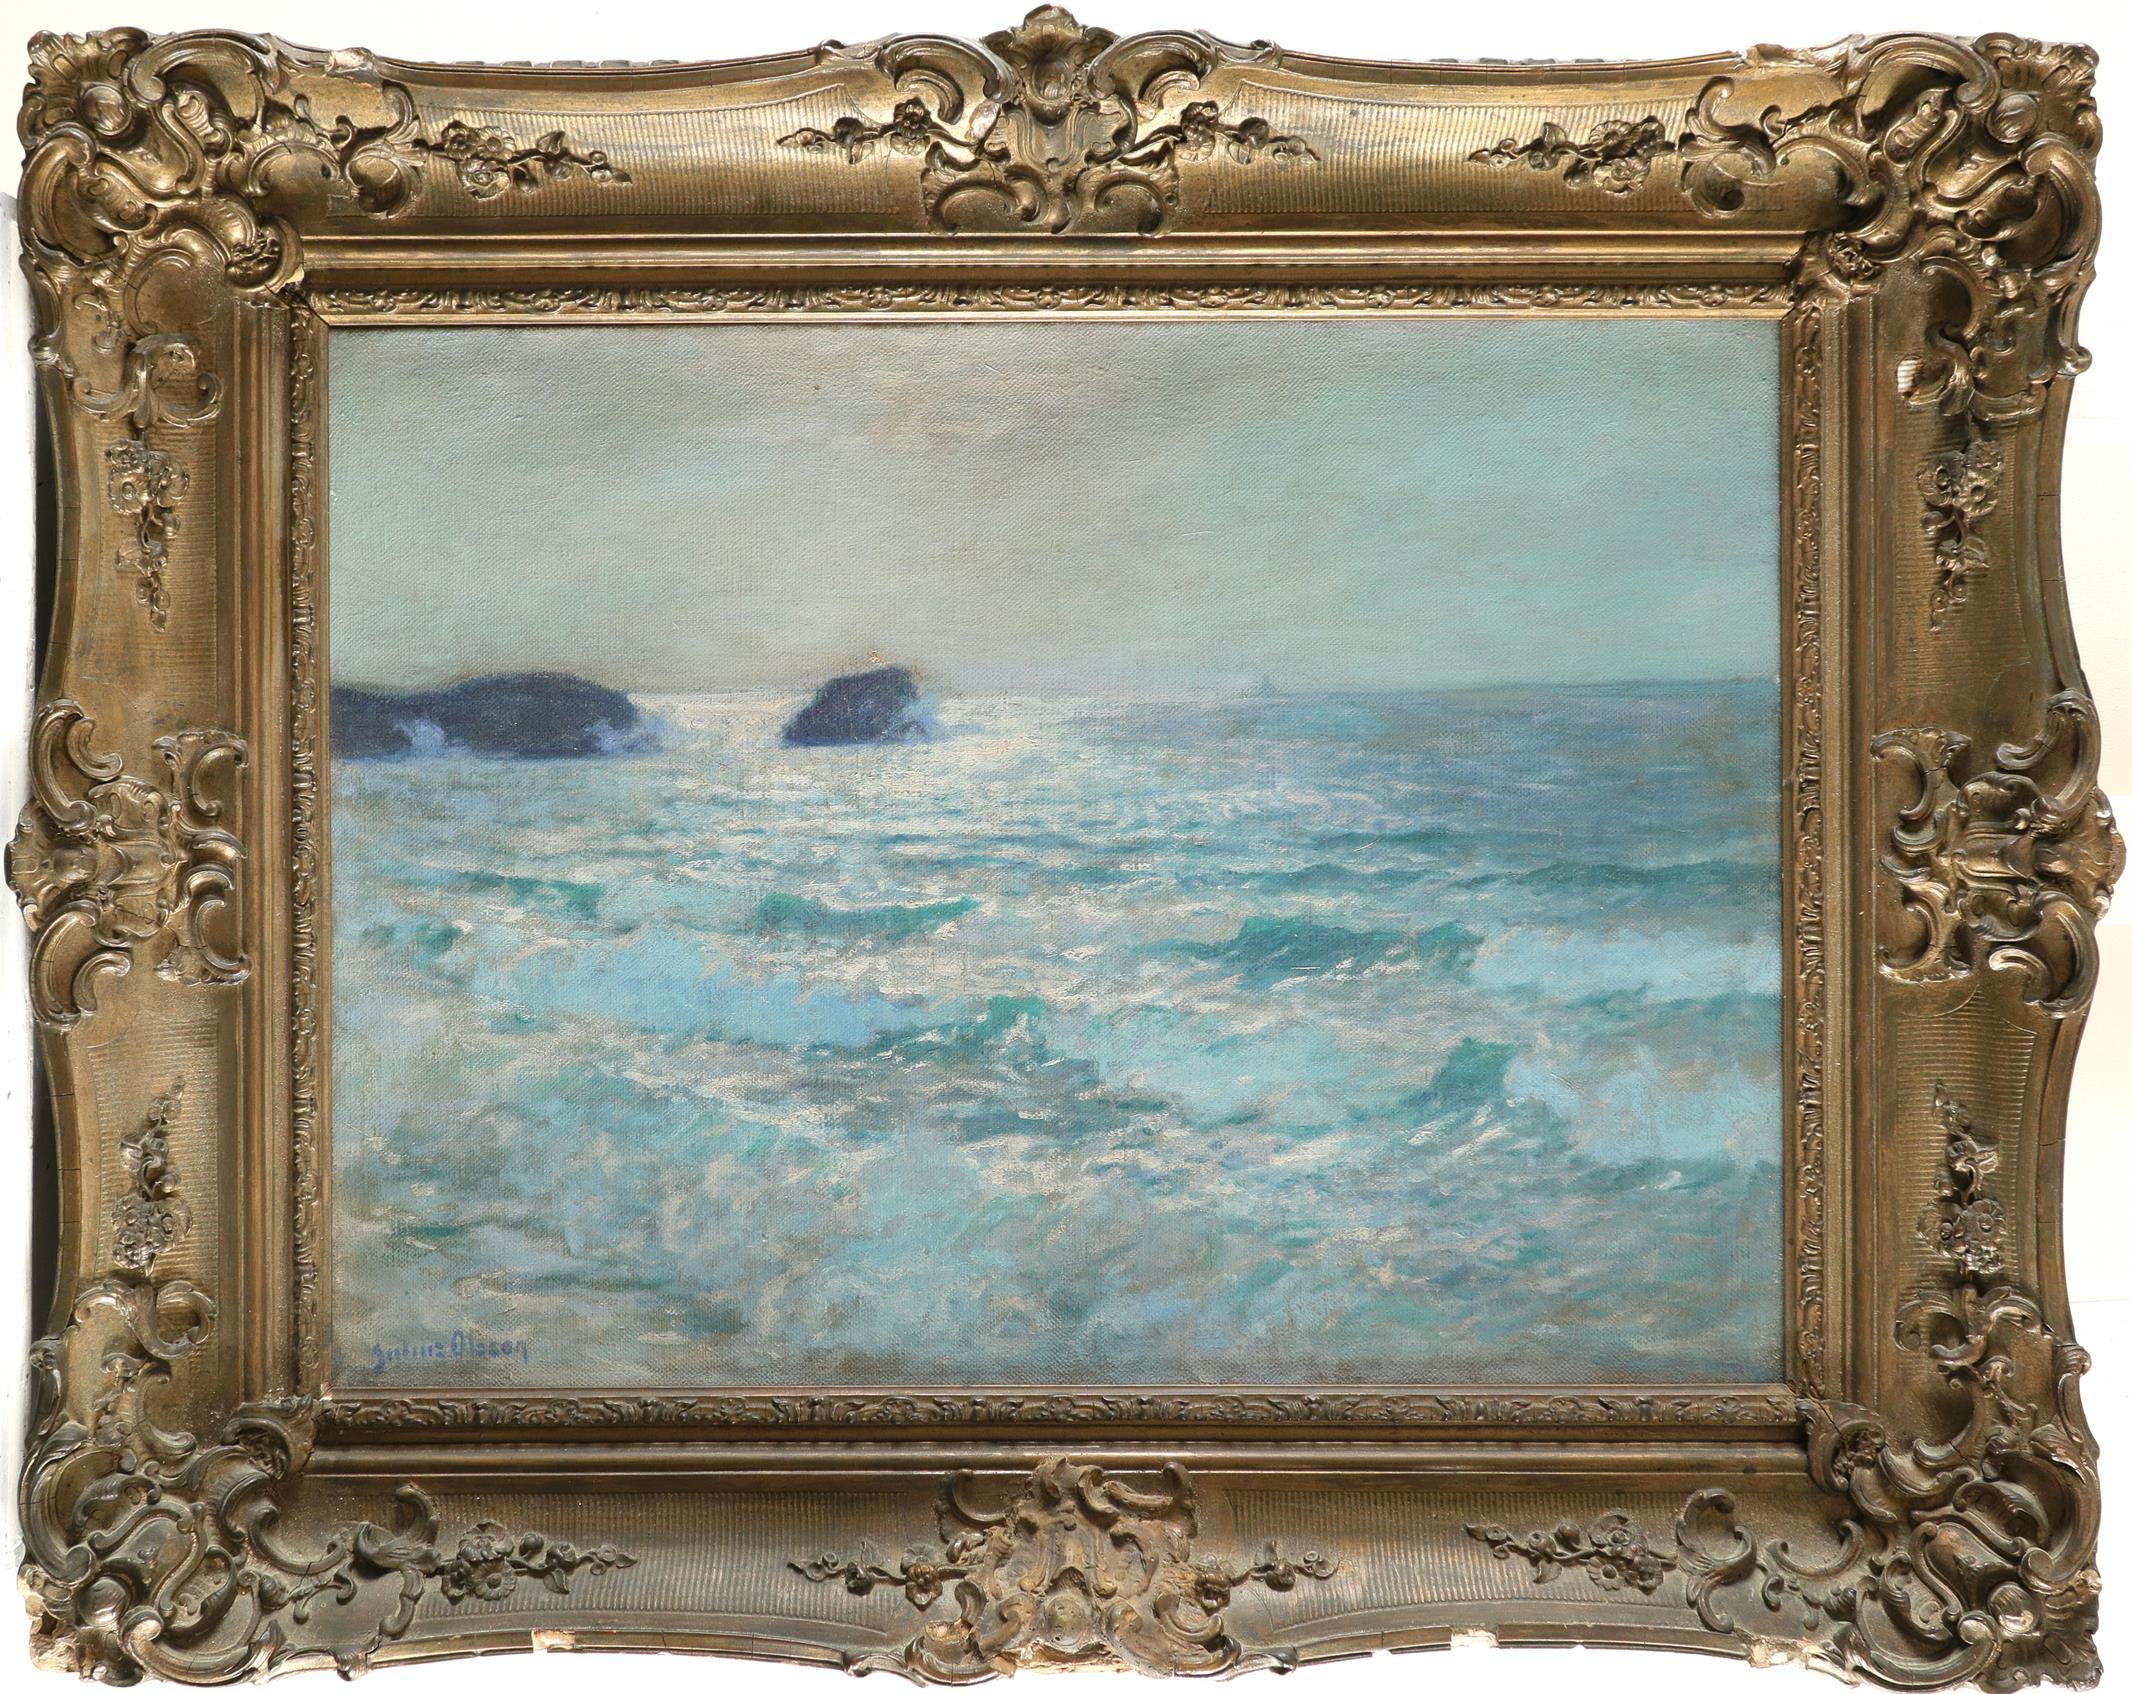 Julius Olsson RA (1864-1942) A calm sea Signed Julius Olsson (lower left) Oil on canvas 45.5 x 61cm - Image 2 of 3